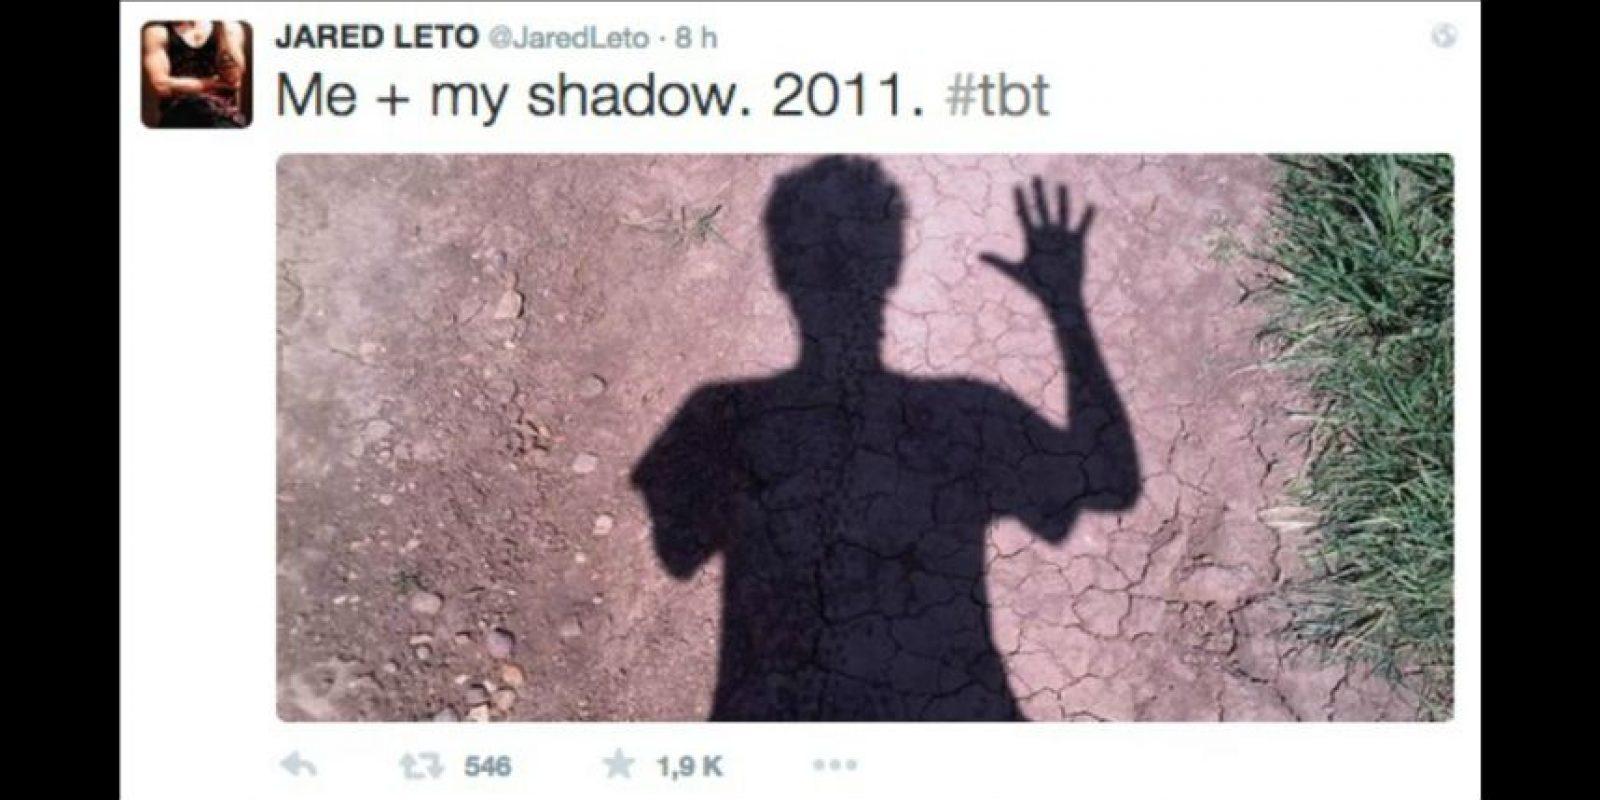 Jared Leto Foto:Twitter/JaredLeto